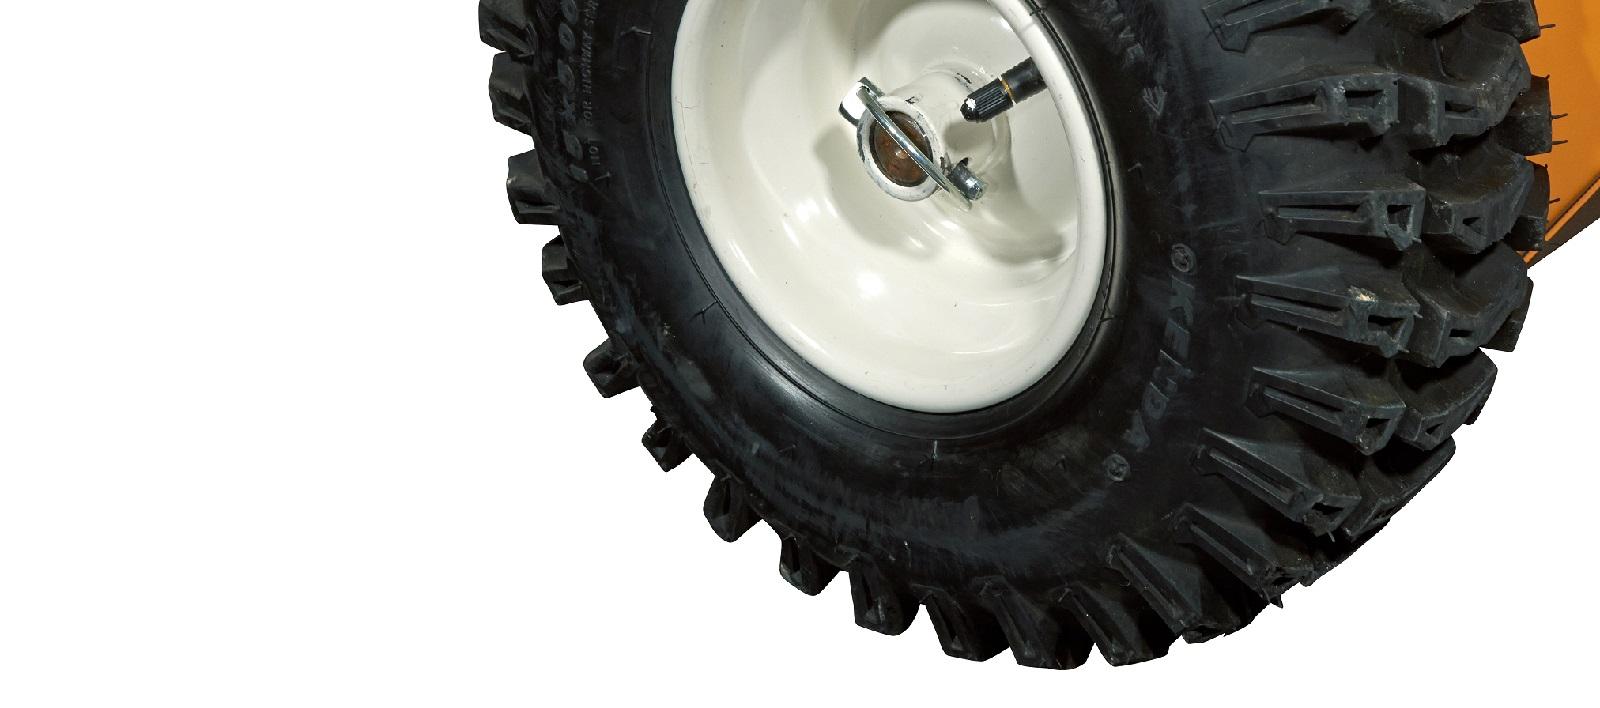 Cleanion-roues-motorisees